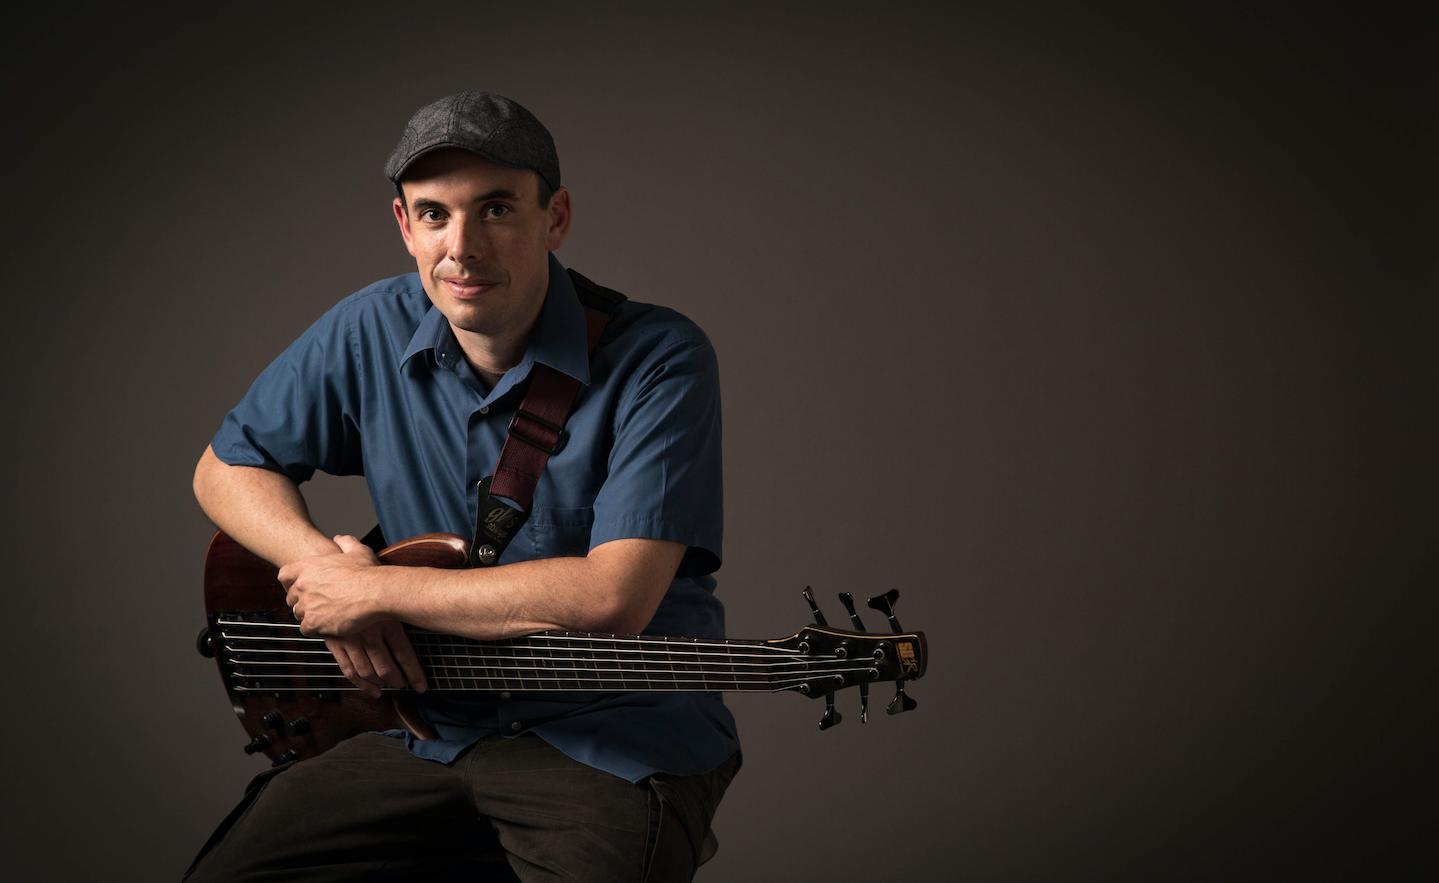 scott varney bass player headshot